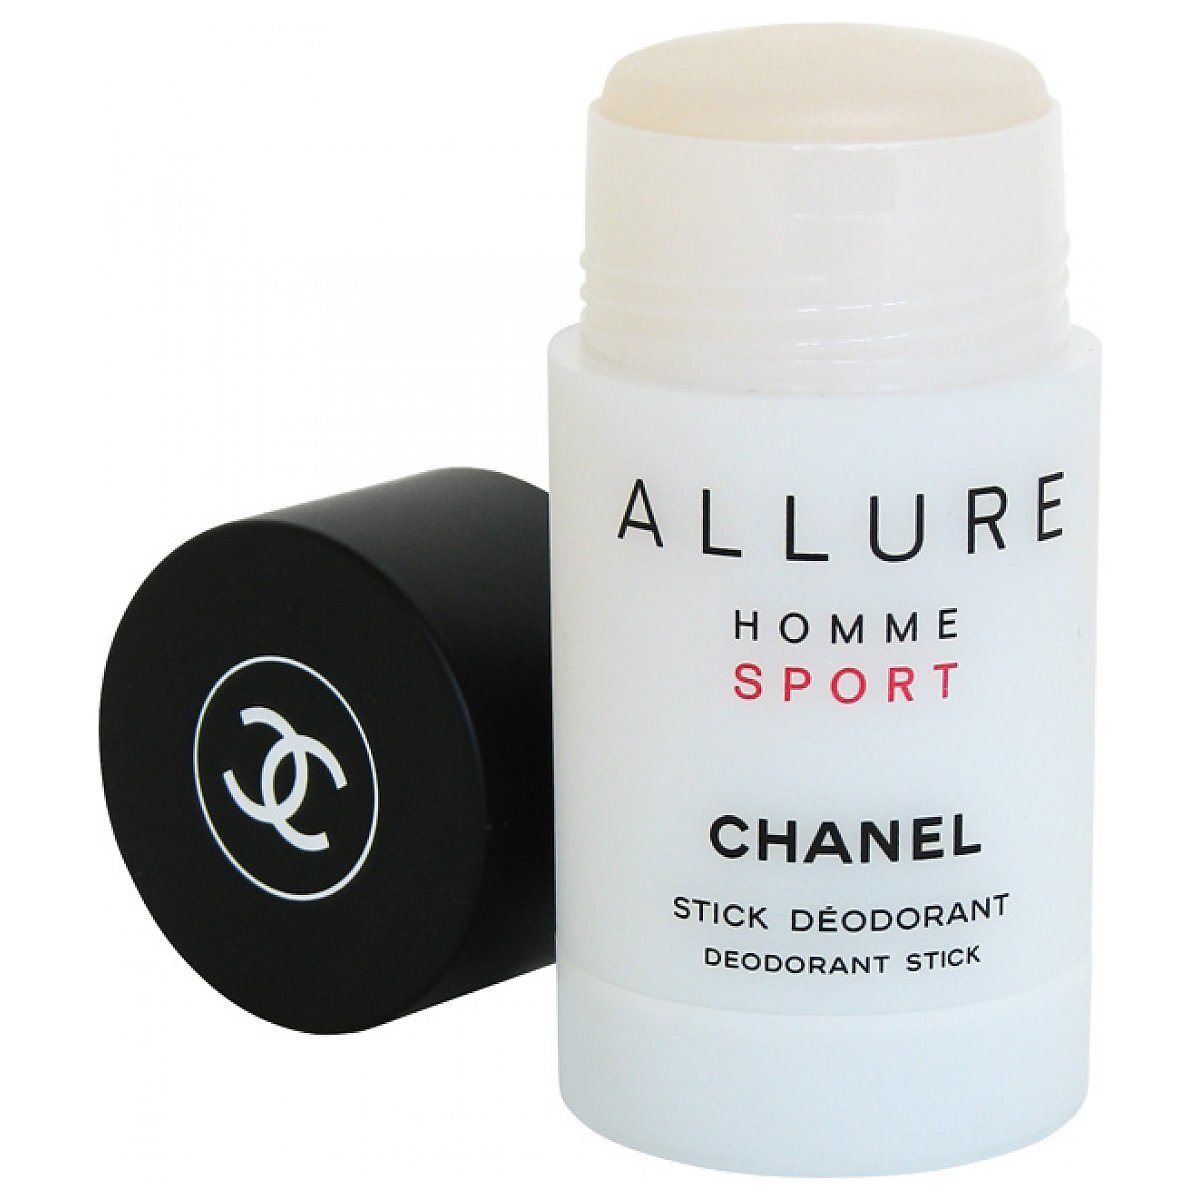 chanel allure homme sport dezodorant sztyft 75ml 60g. Black Bedroom Furniture Sets. Home Design Ideas